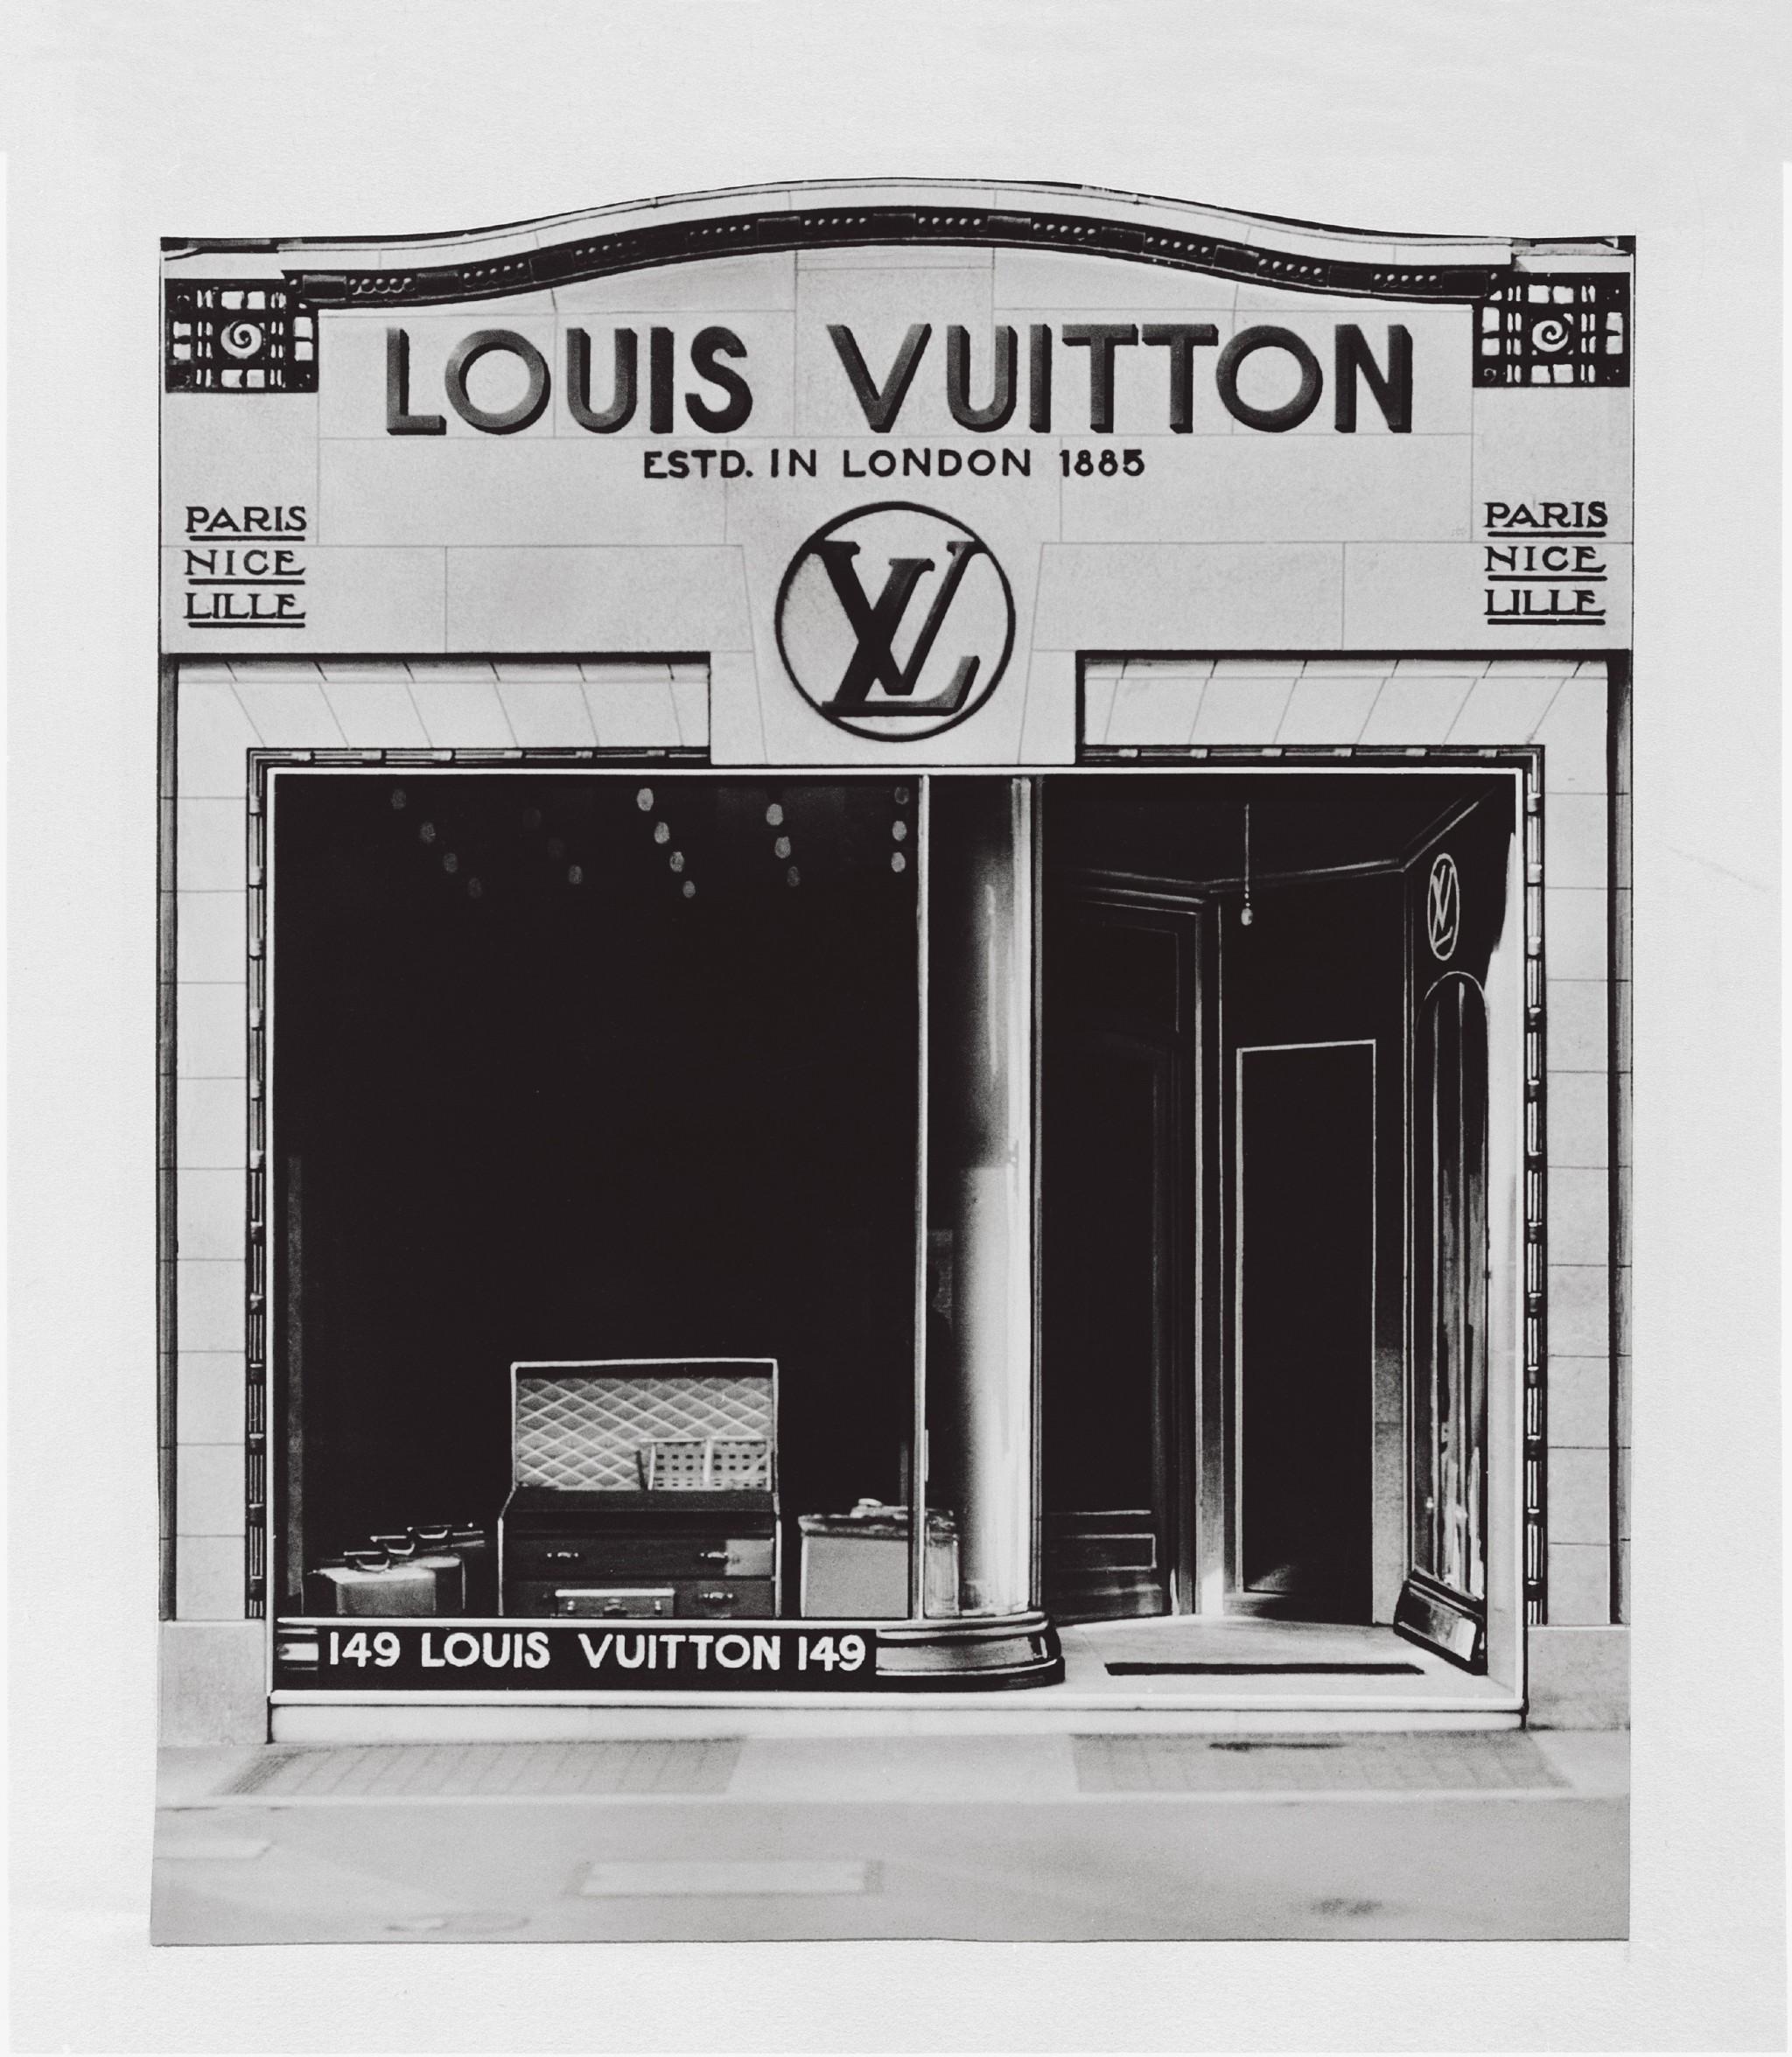 Louis Vuitton History